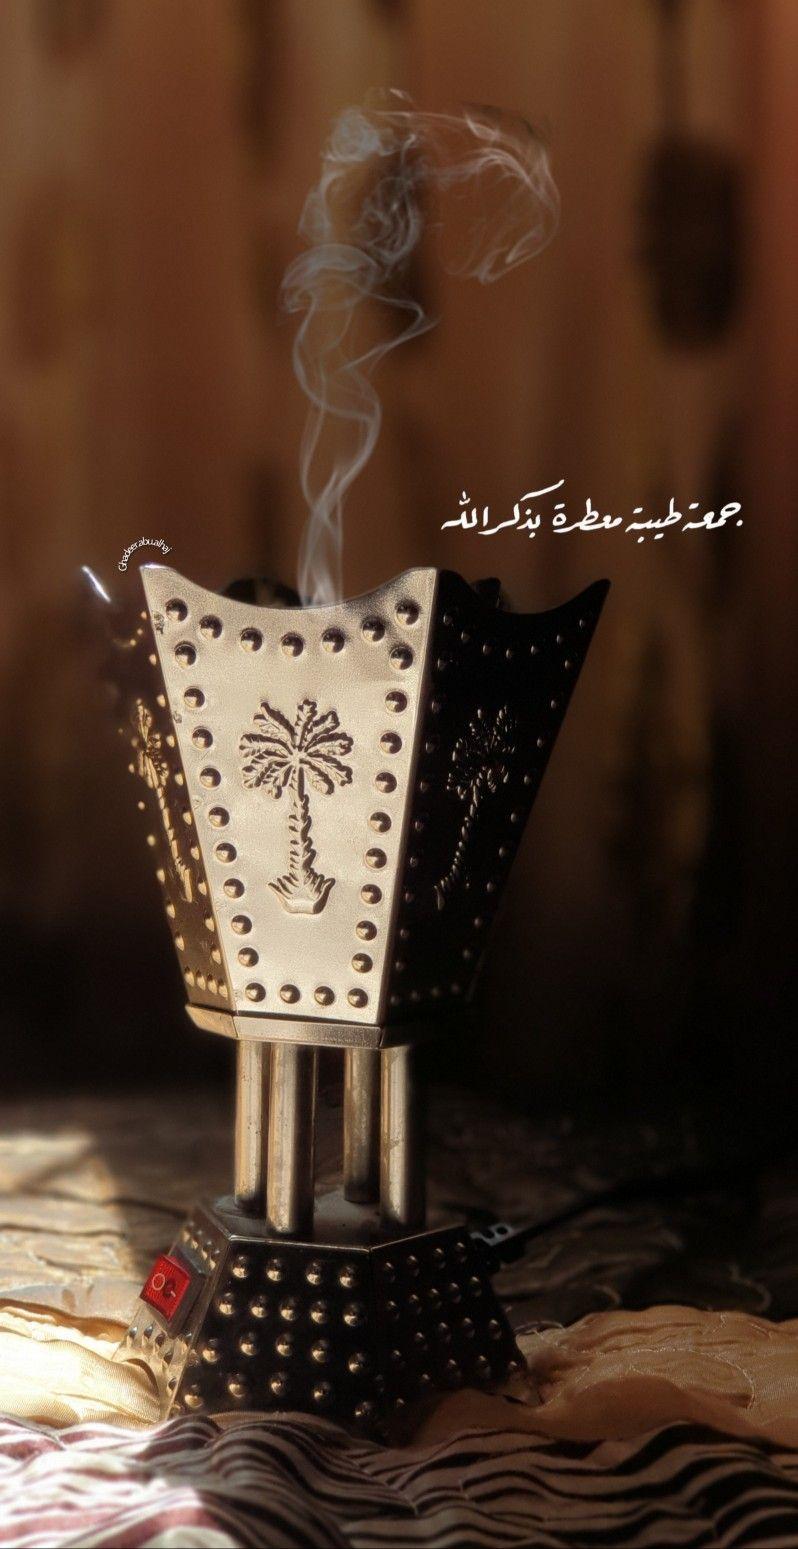 جمعة معطرة بذكر الله Islamic Art Photo Quotes Arabic Love Quotes